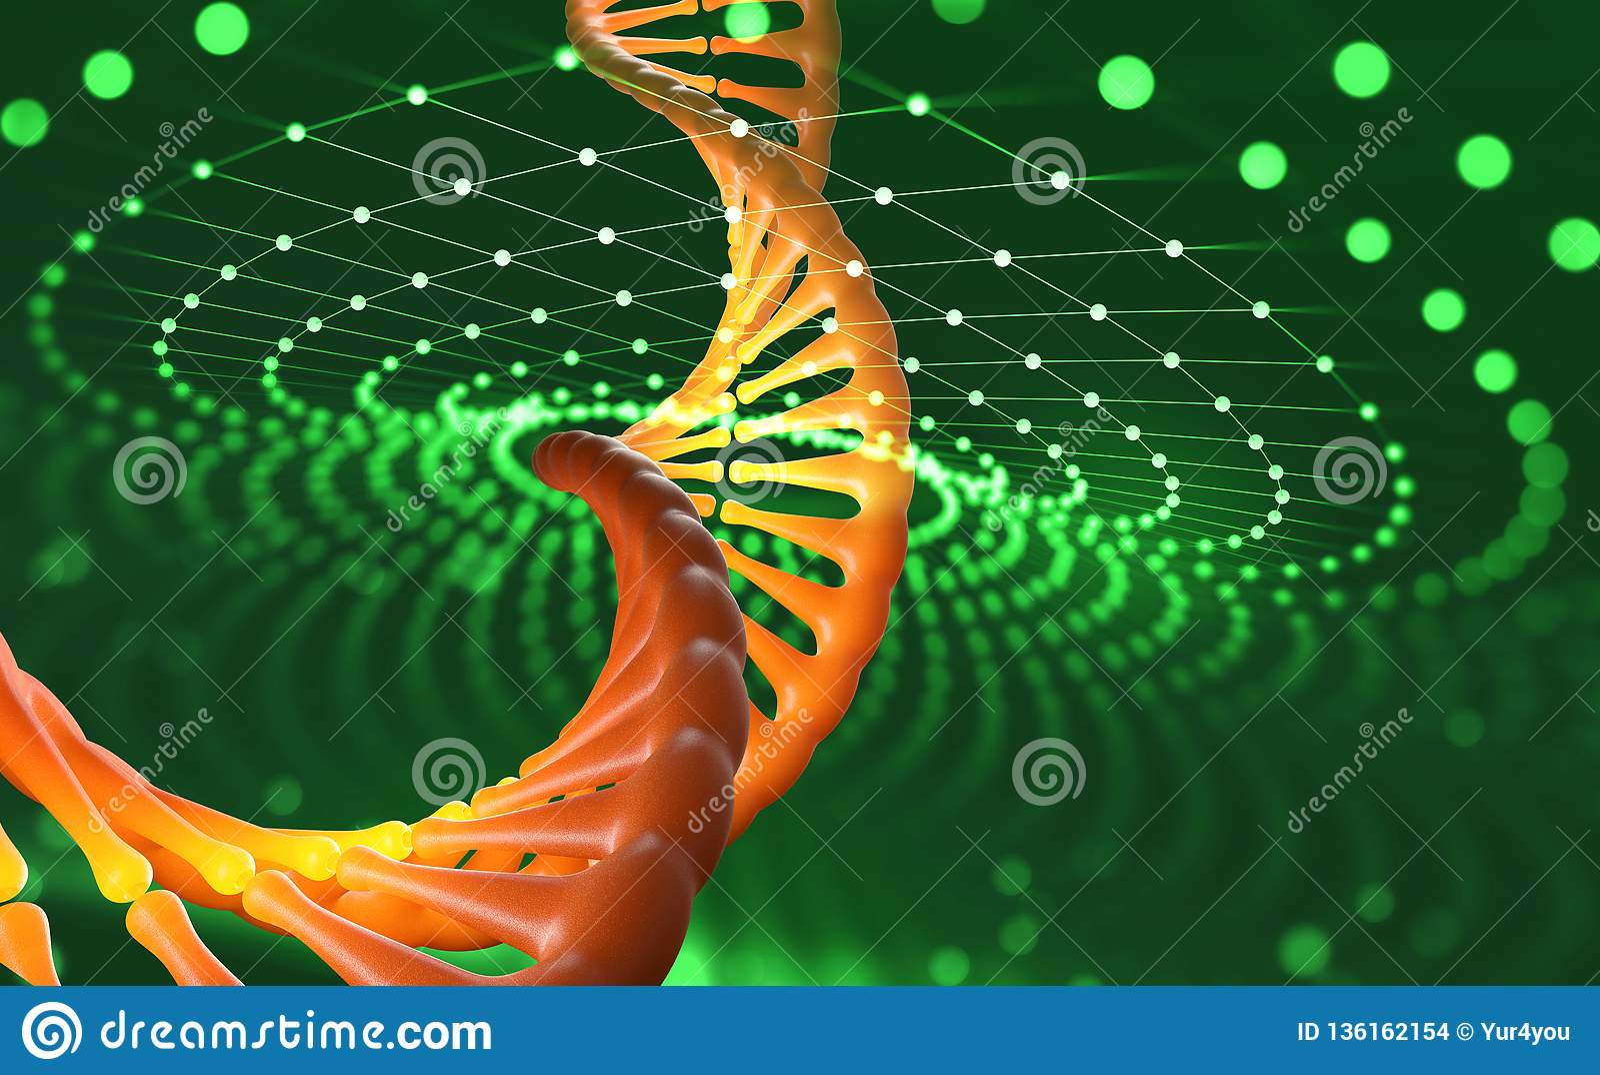 Hélice do ADN Tecnologias inovativas na pesquisa do genoma humano Inteligência artificial na medicina do futuro